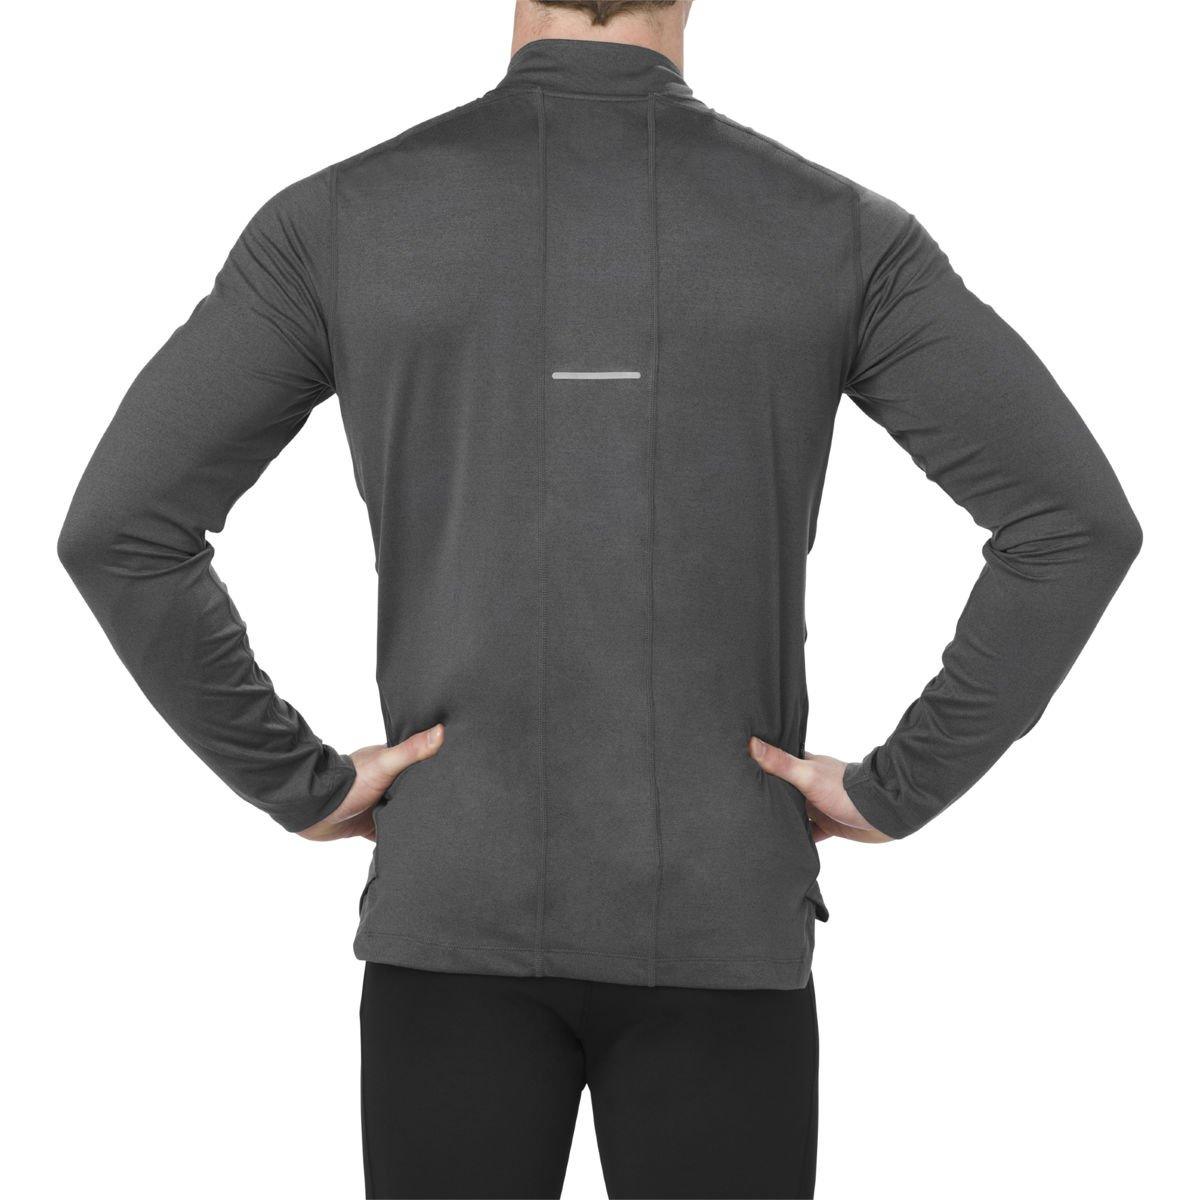 Bluza do biegania Asics Jersey LS 12 ZIP 154589 0773